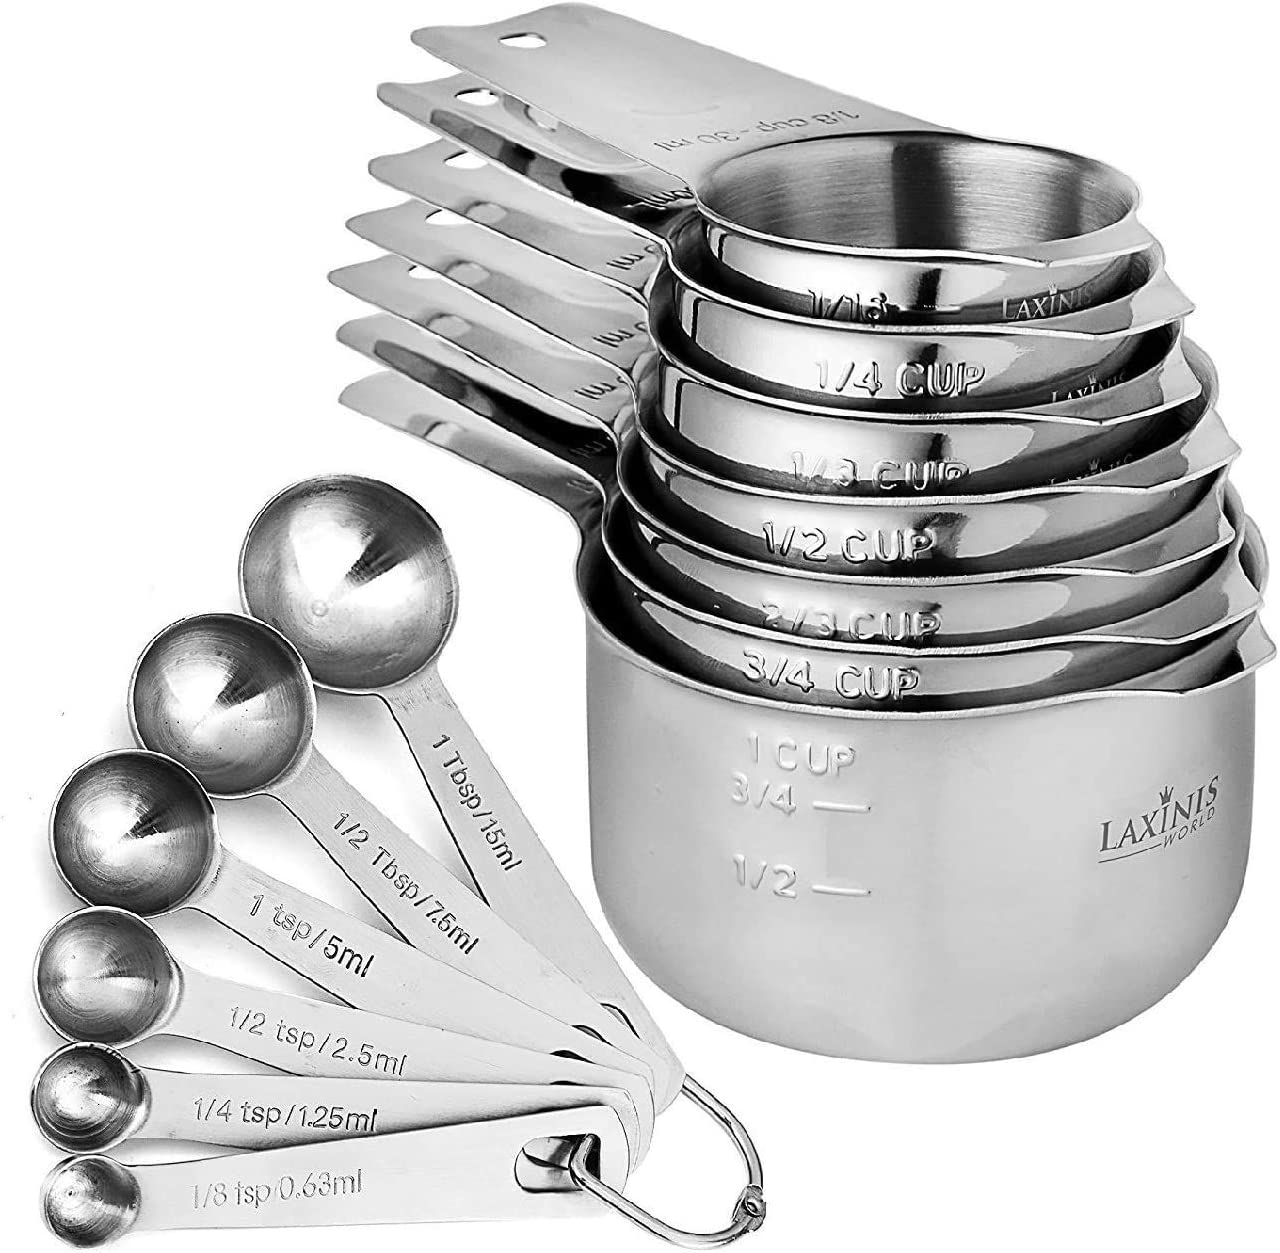 Spout and Stackable Spoons Container Measuring Cup for Measuring Tea Coffee Measuring Cup and Spoon Set Kitchen Utensil 7Pcs//Set Kitchen Measuring Set